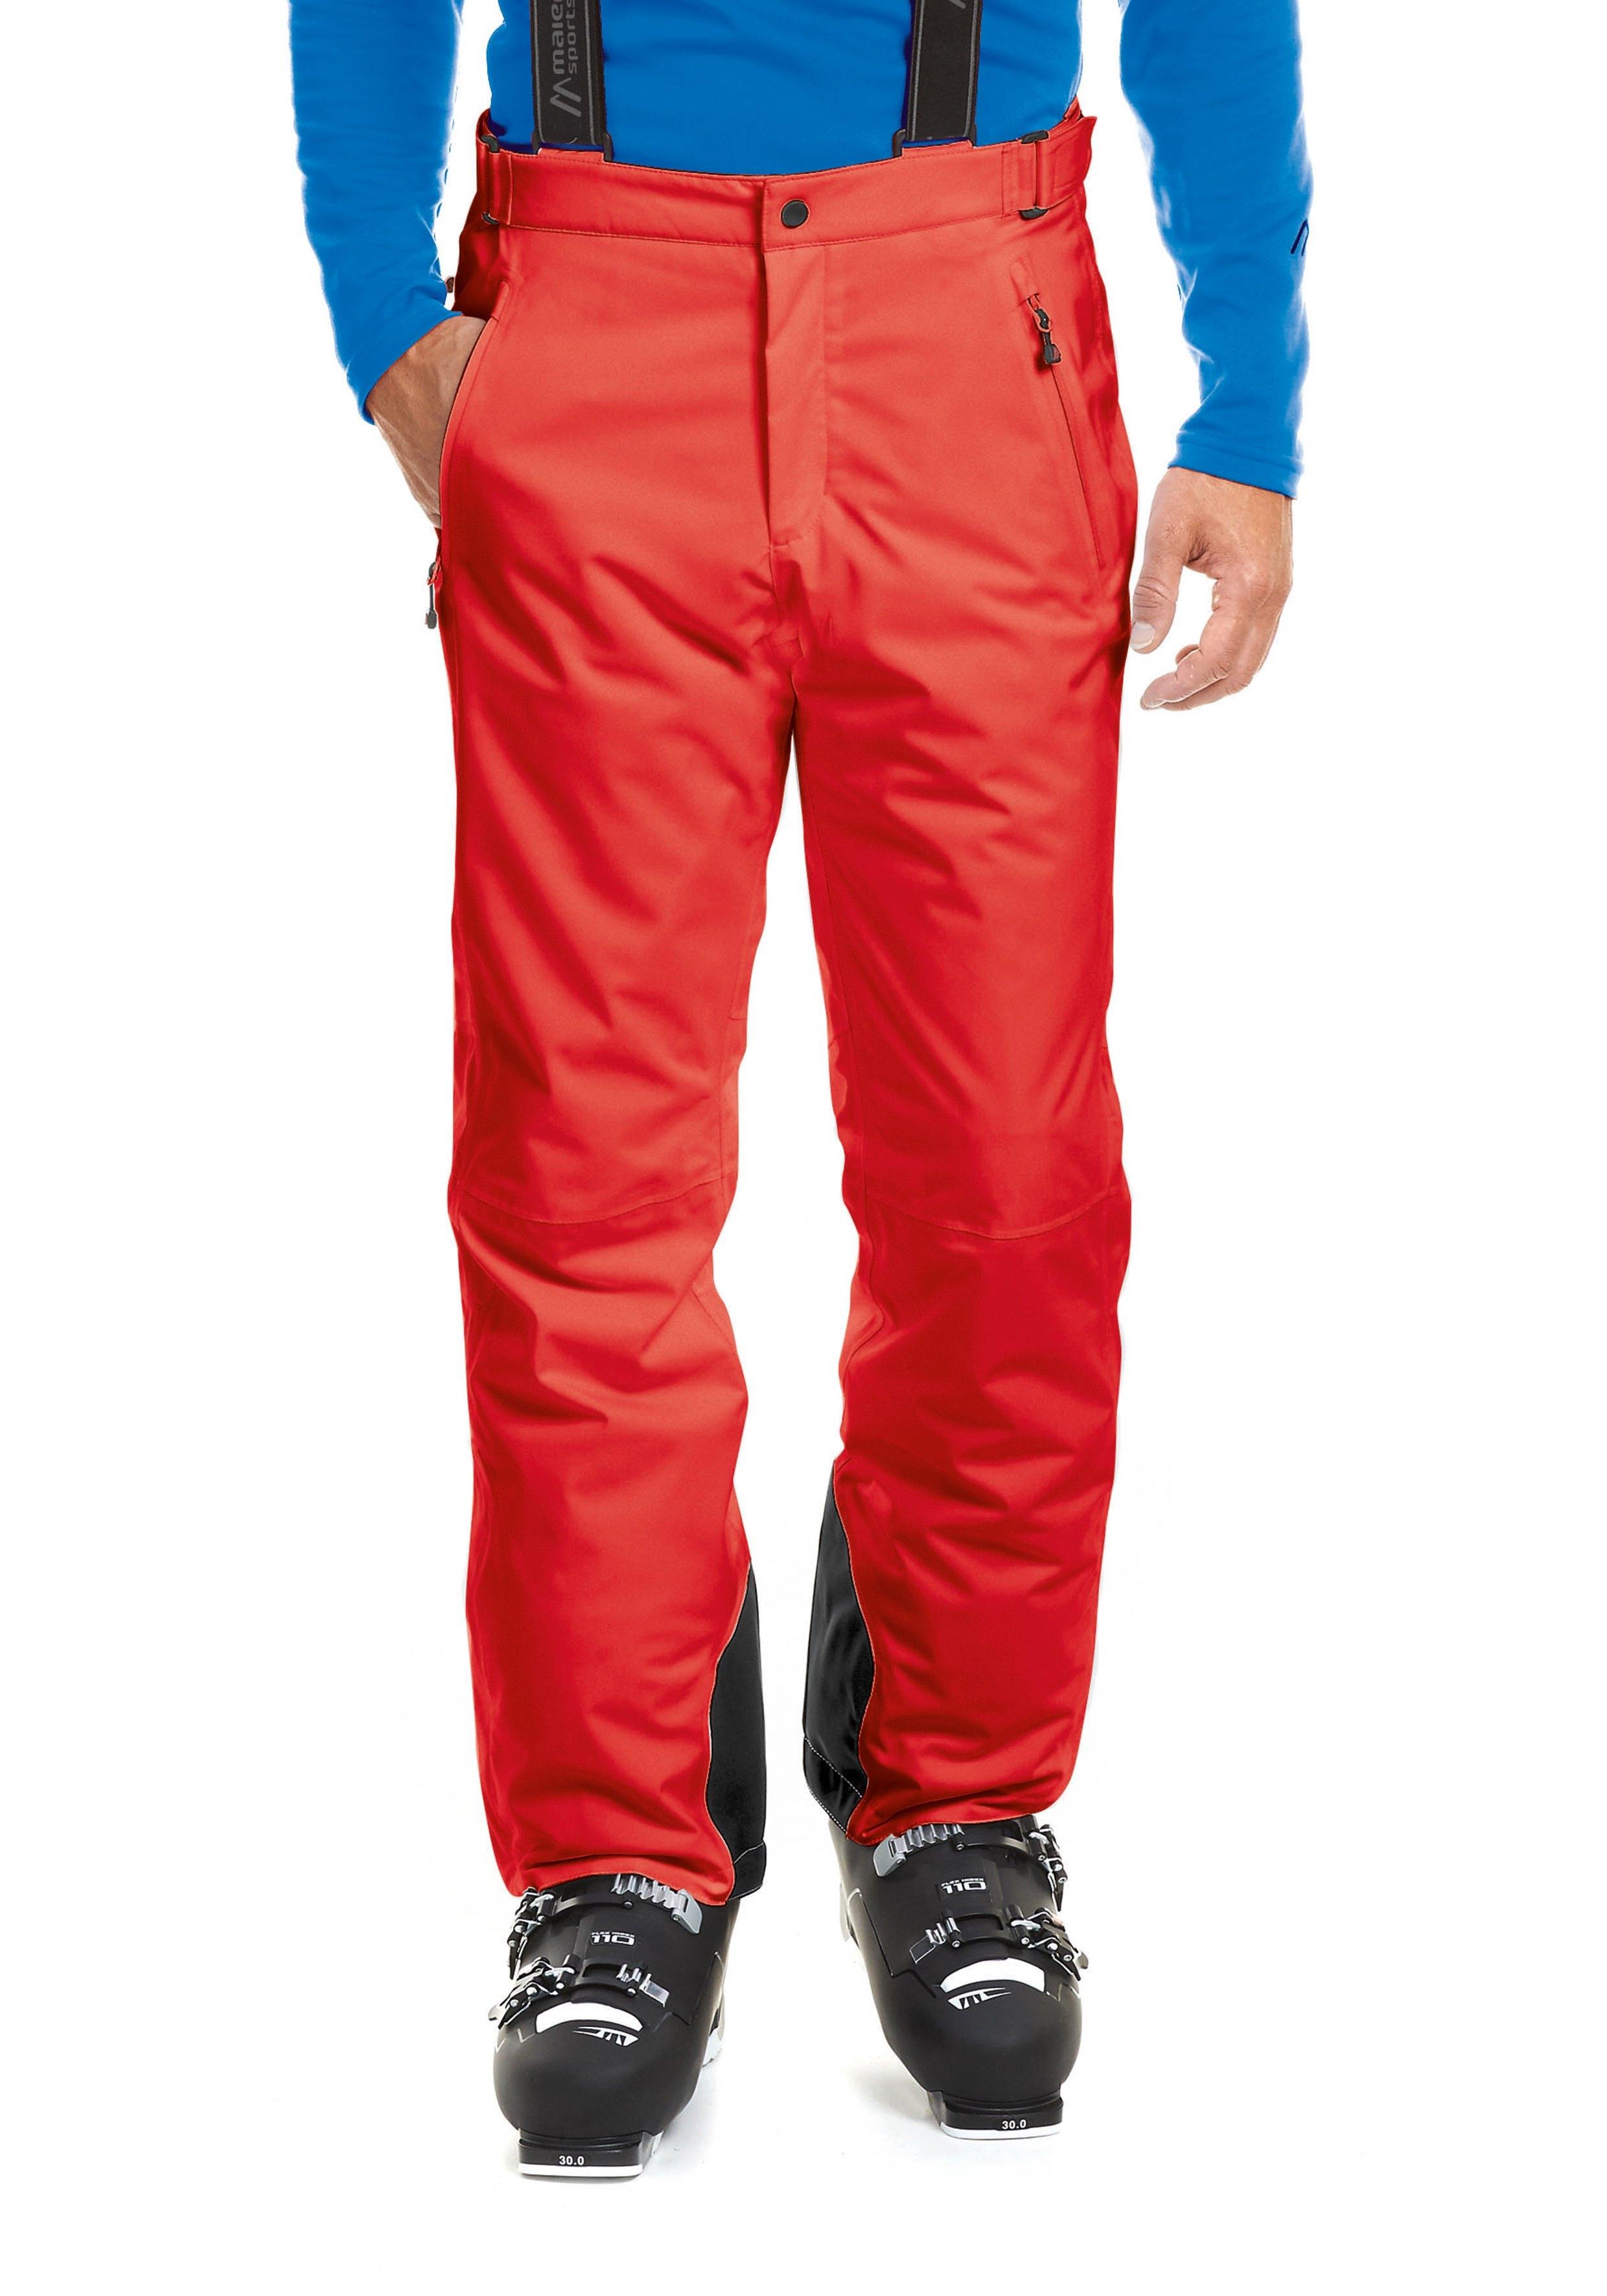 Maier Sports skibroek Anton 2 Water- en winddicht nu online bestellen